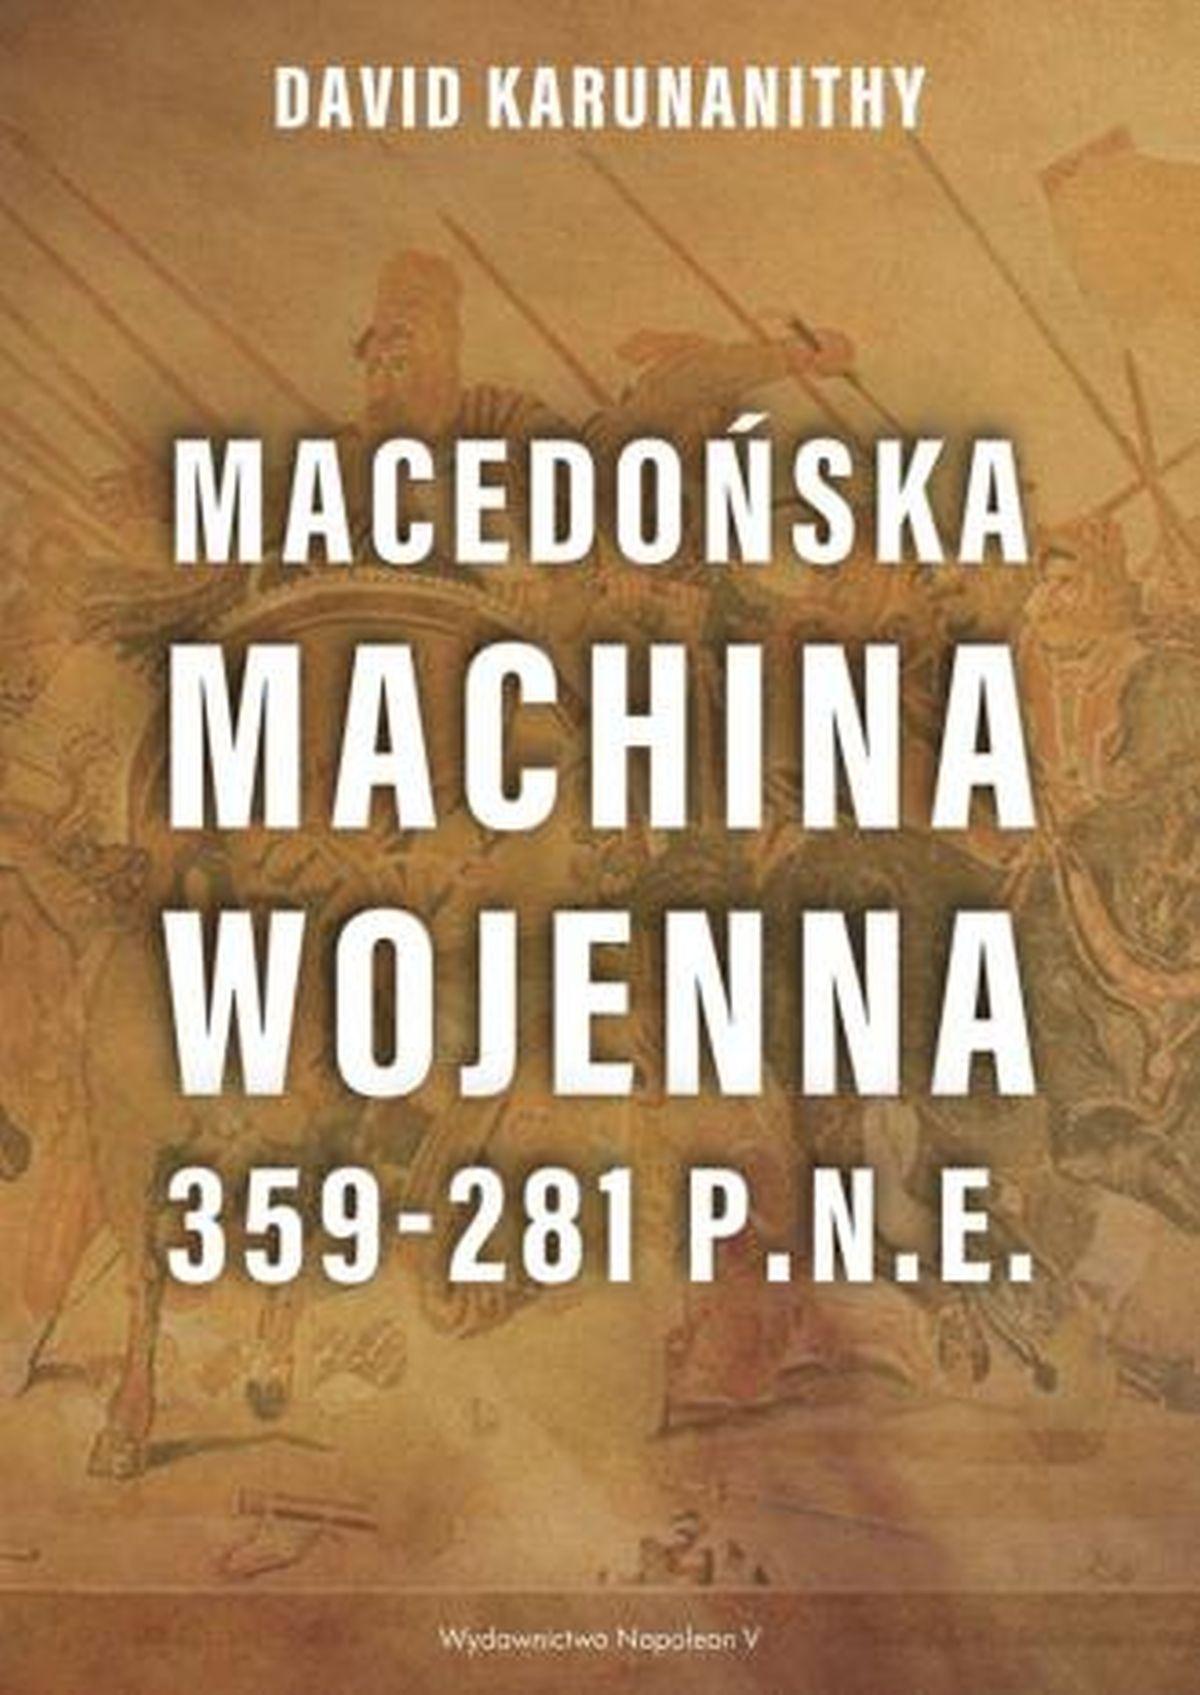 David Karunanithy, Macedońska machina wojenna 359-281 p.n.e.